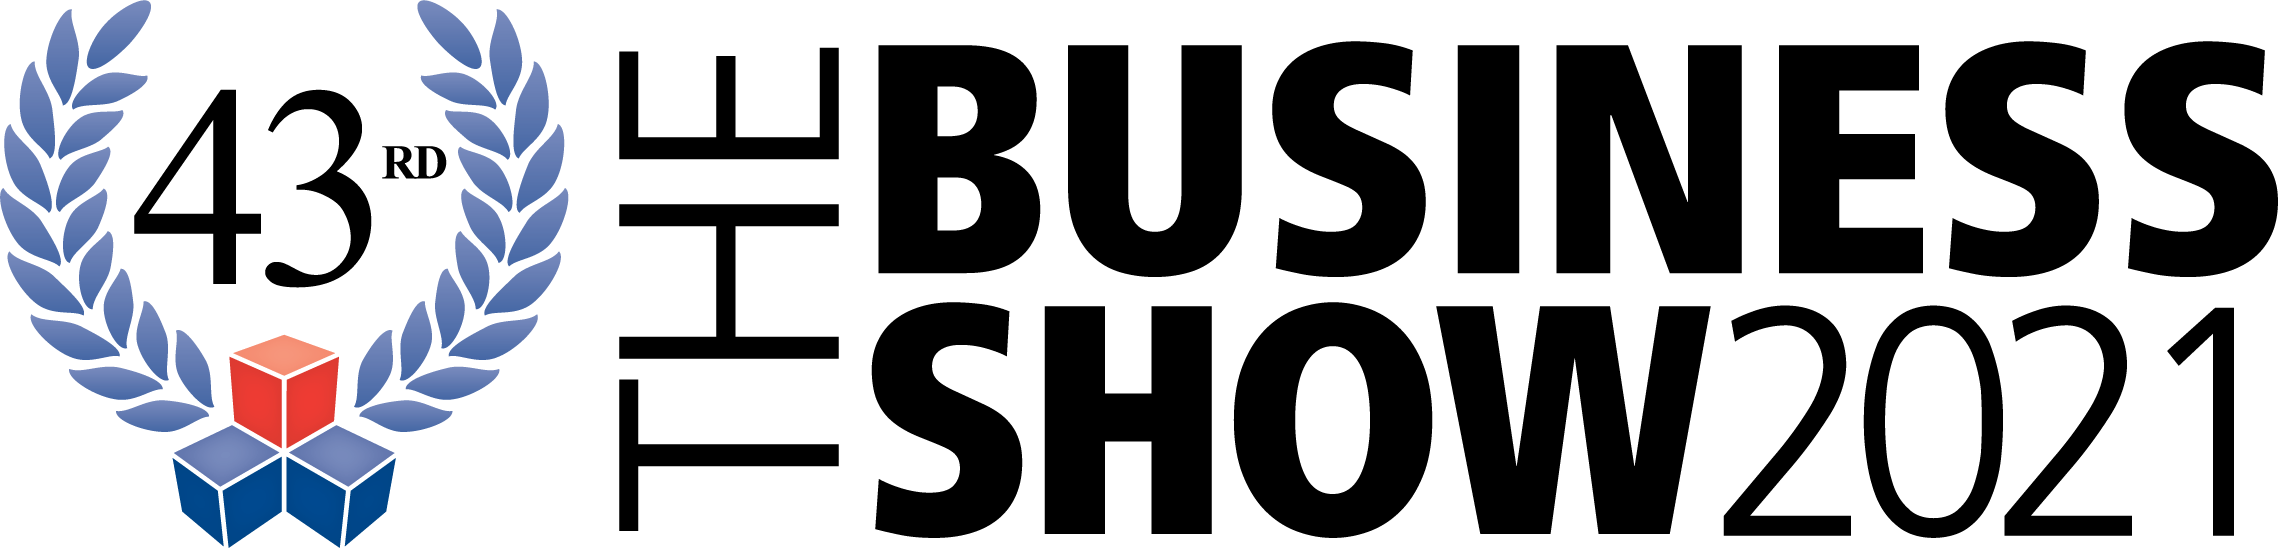 Marketeroes Ltd